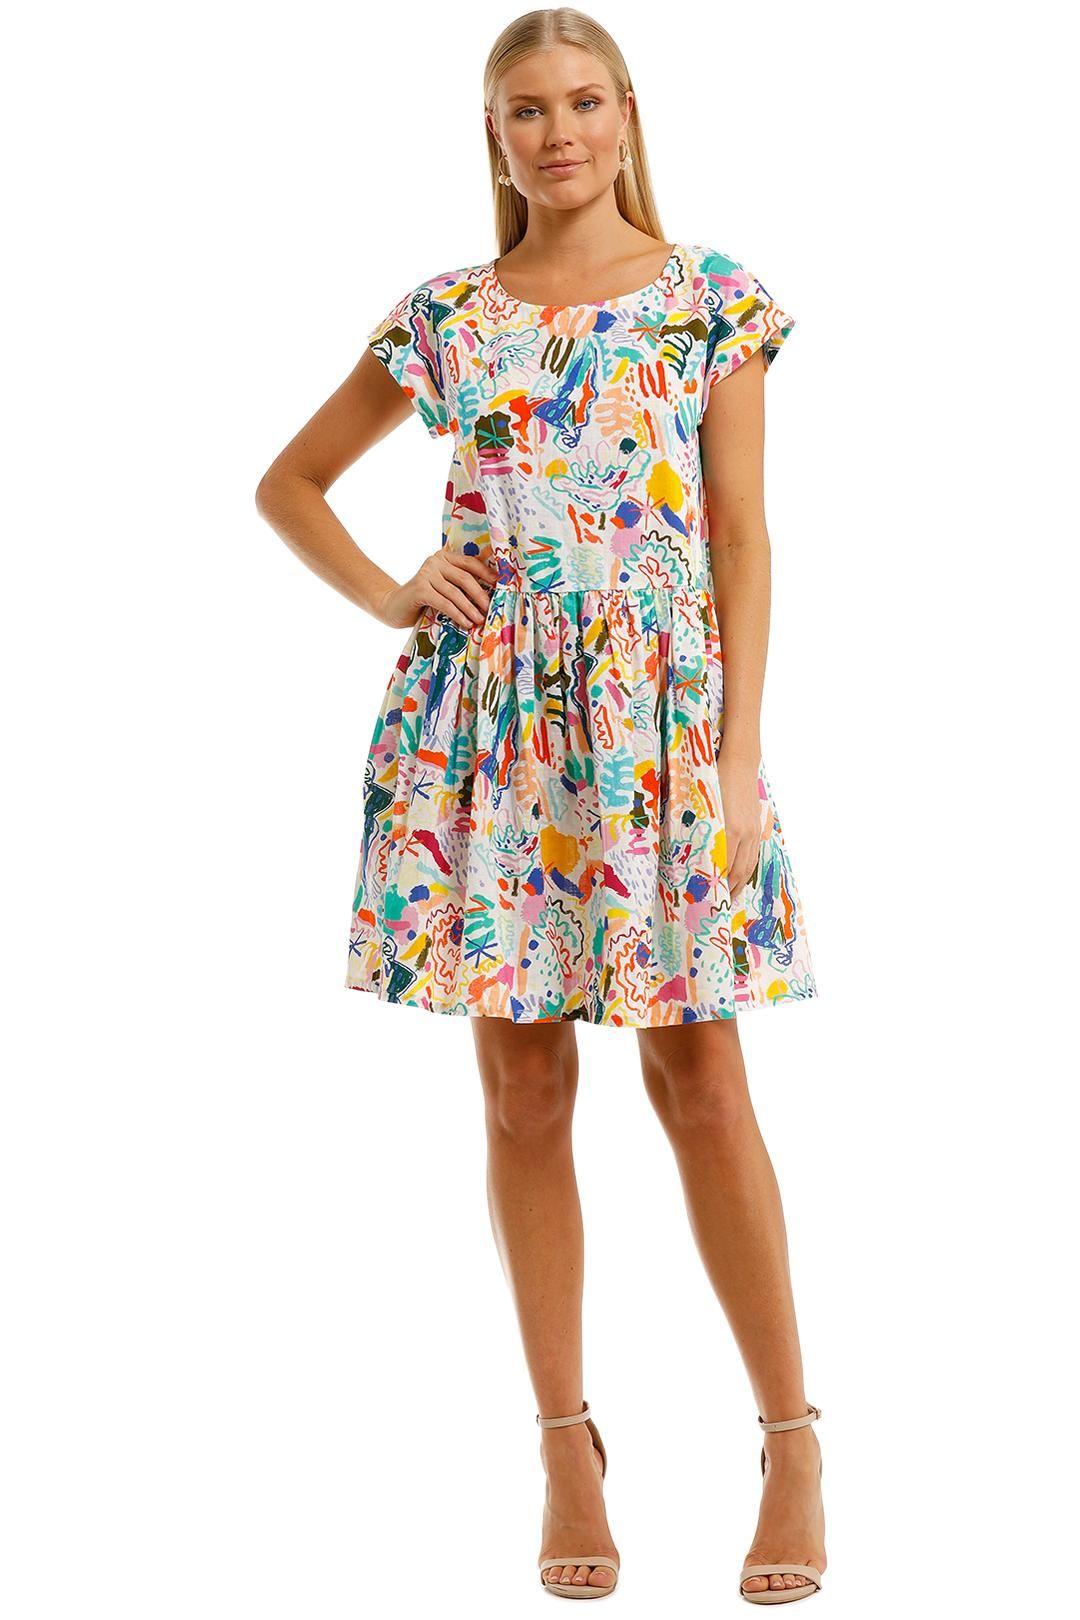 Gorman Coastline Beach Dress Mini Length